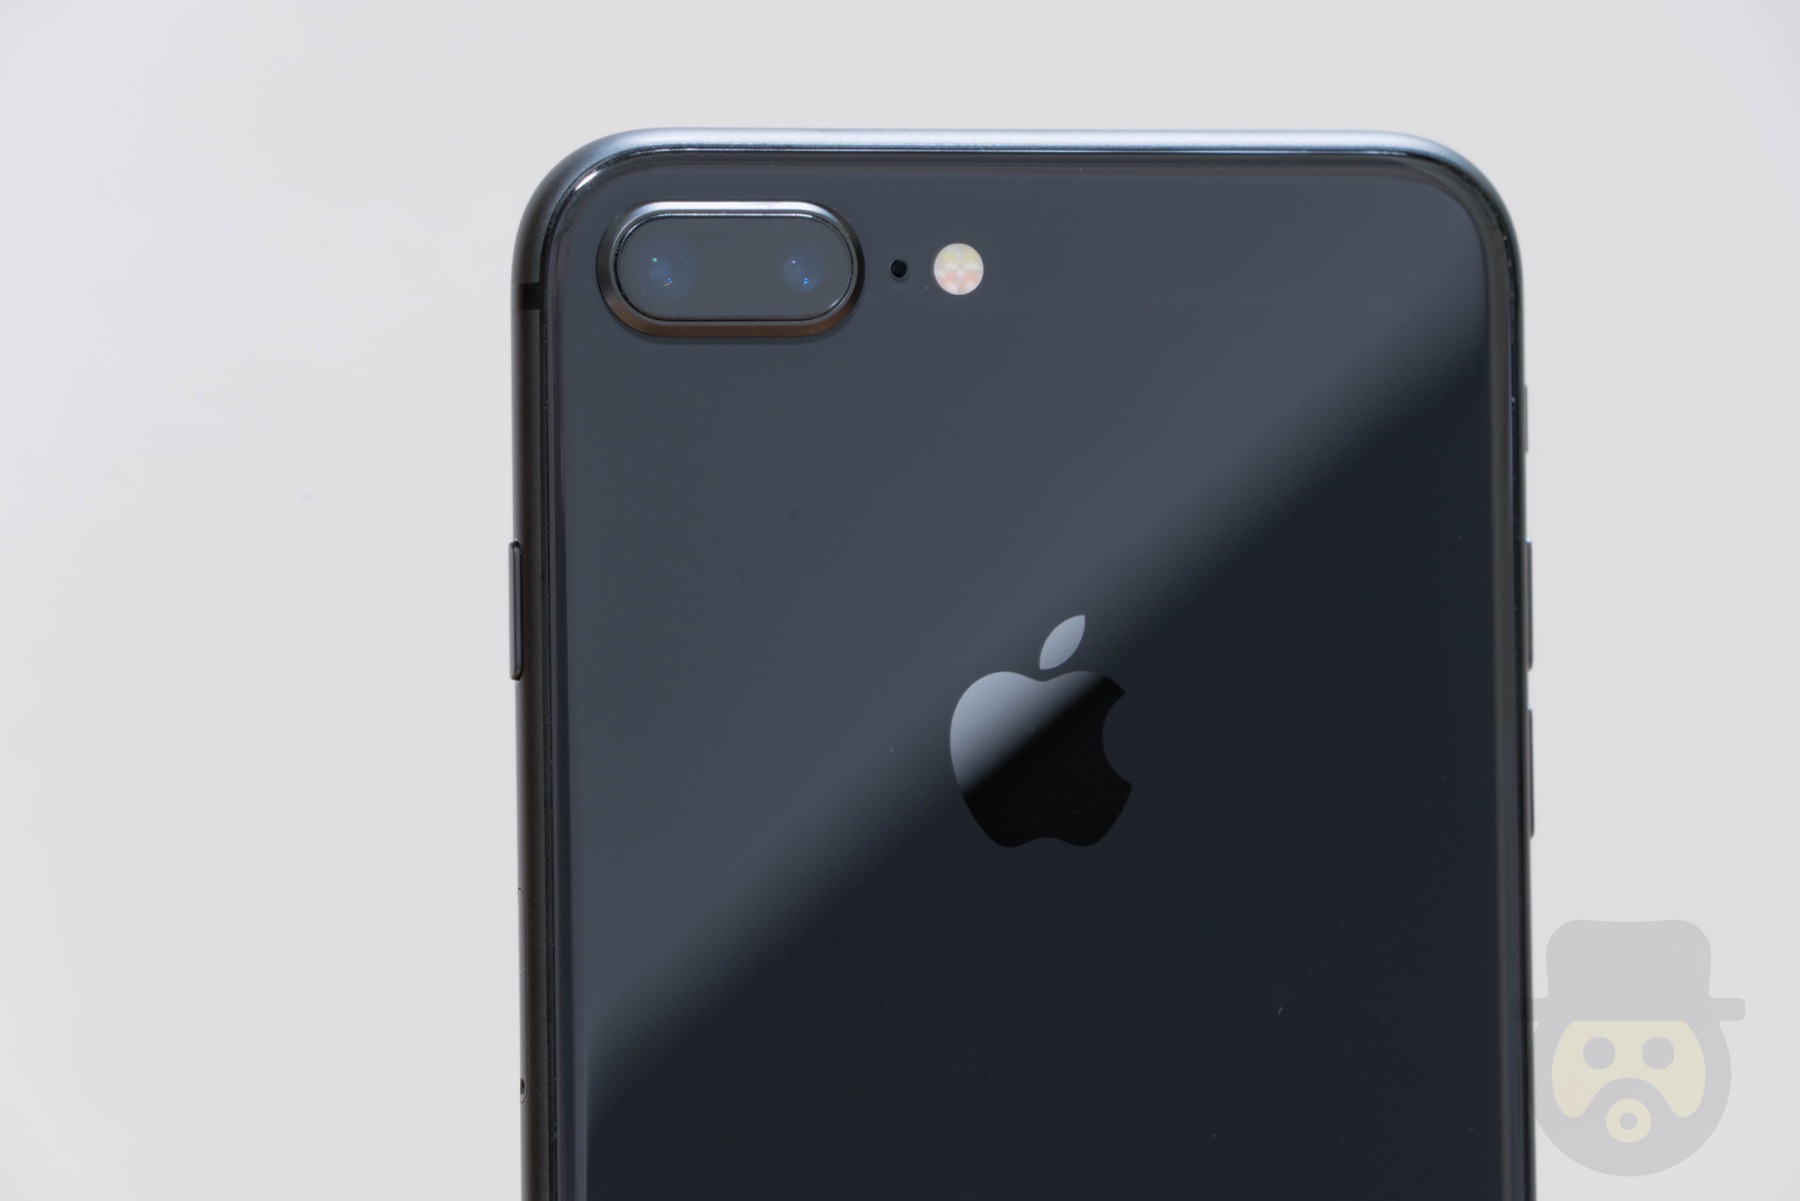 「iPhone 8/8Plus」 の音声通話ノイズ問題、対応方法をAppleサポートに聞いてみた